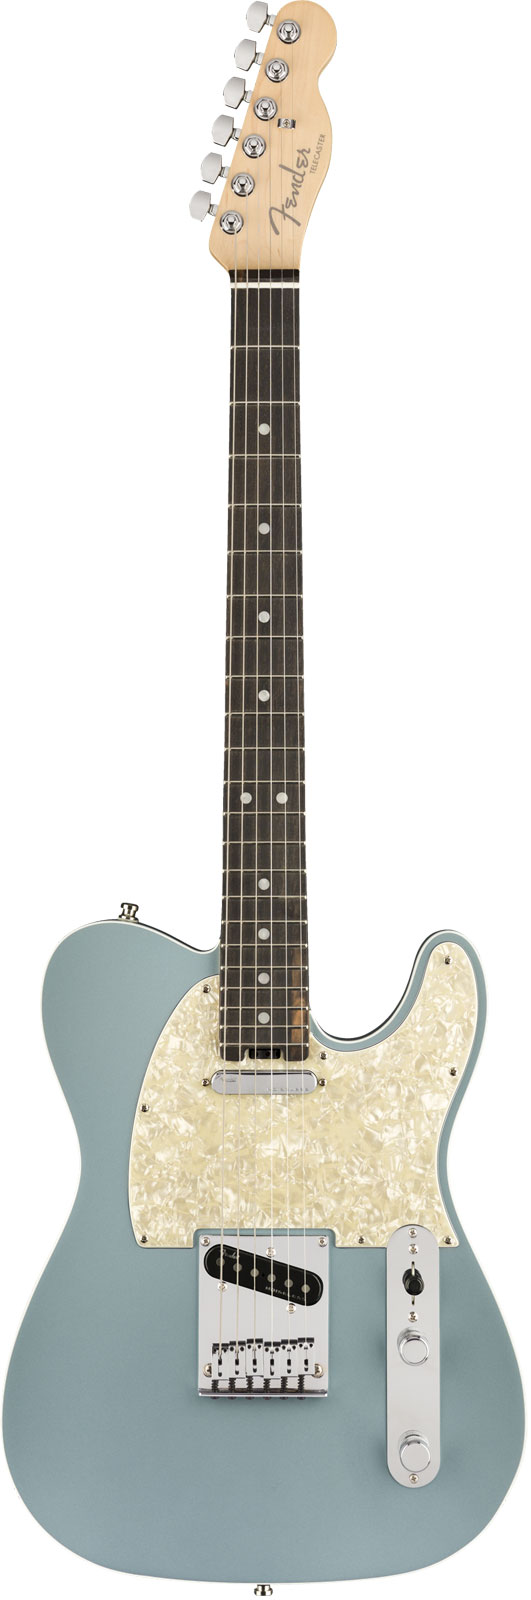 Fender American Elite Telecaster Satin Ice Blue Metallic